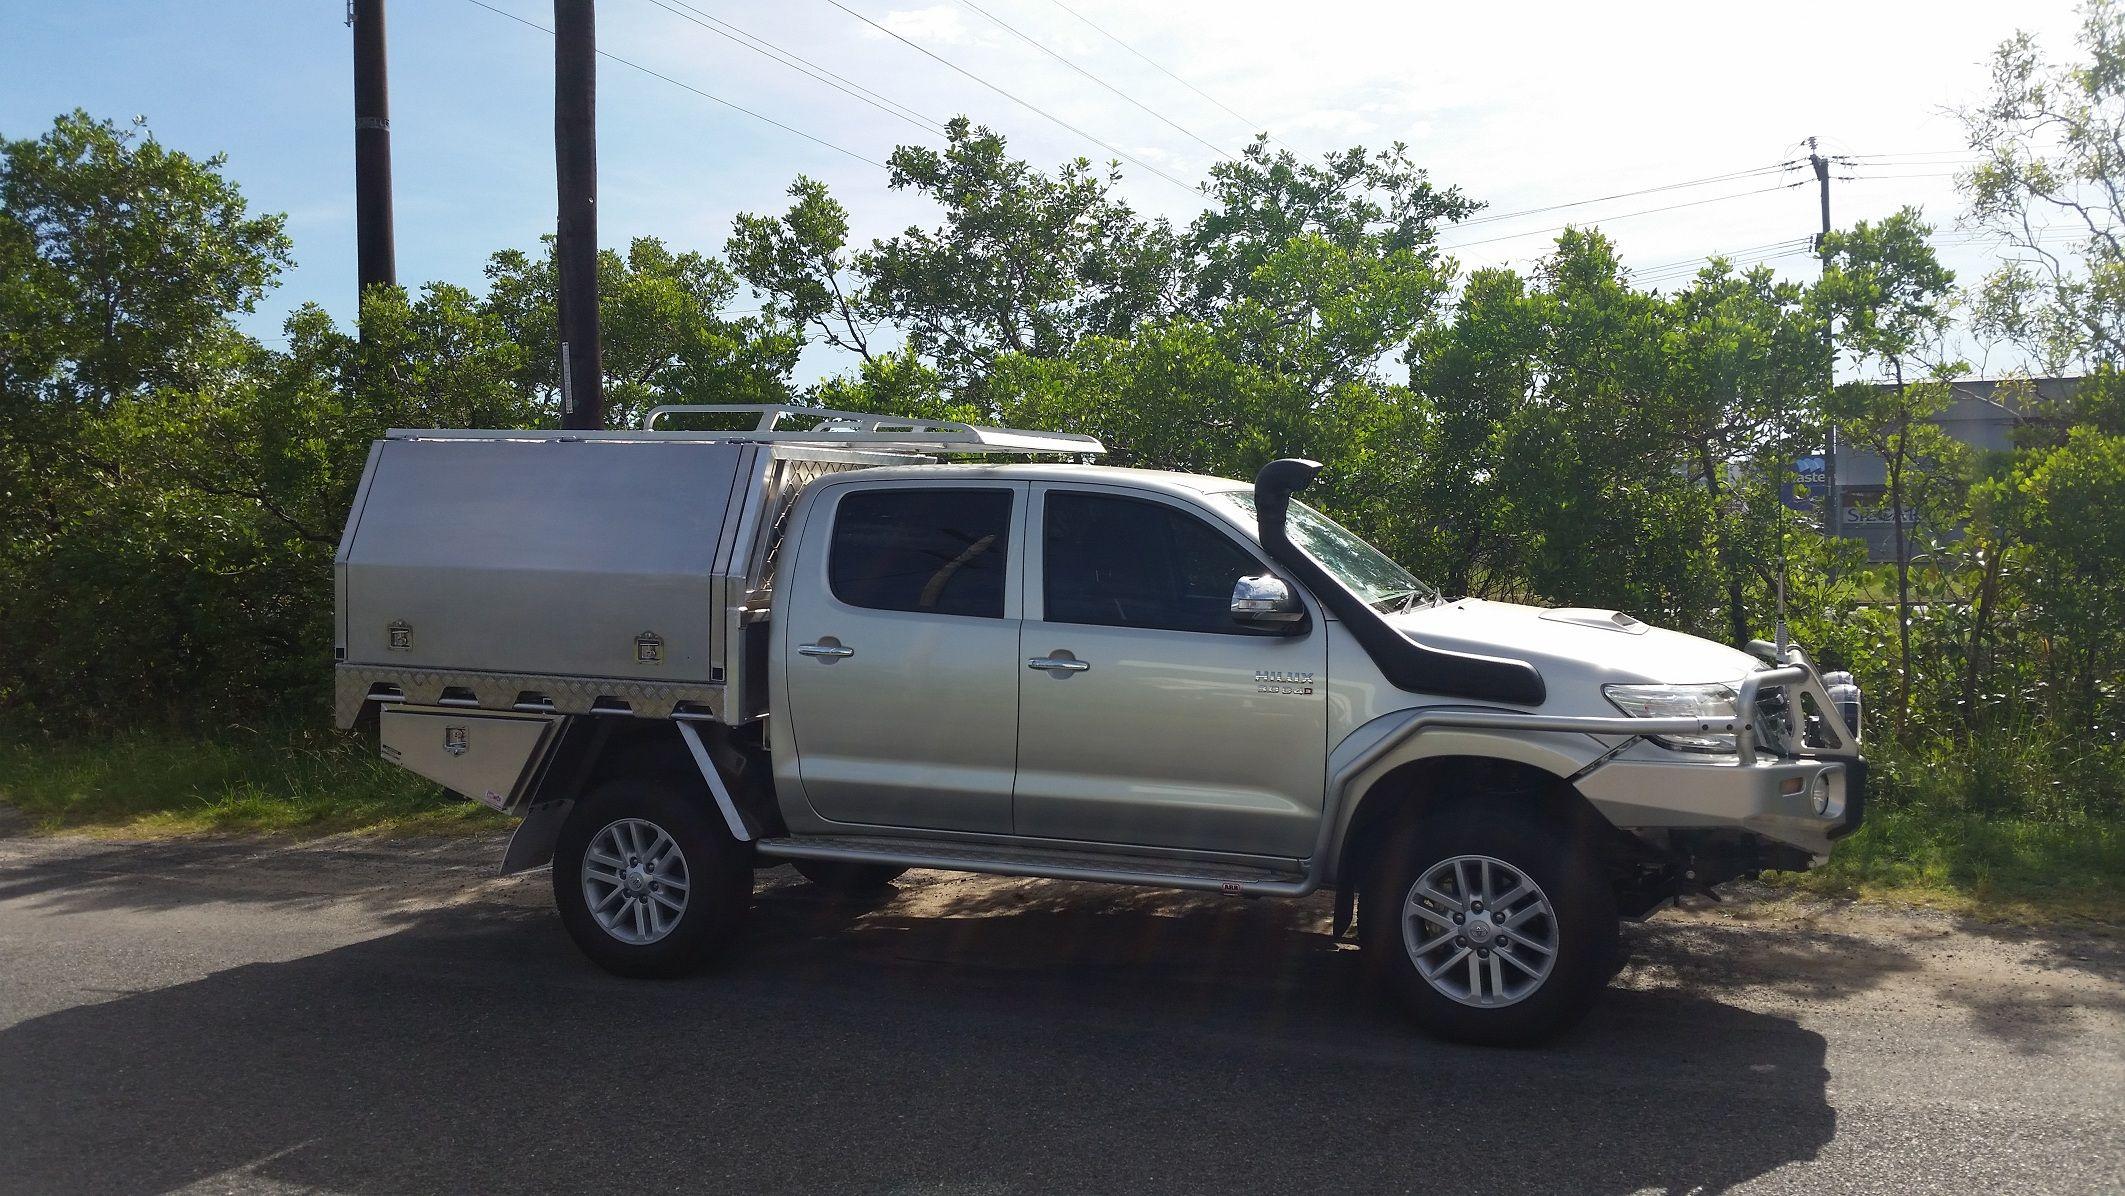 Motor Vehicle Canopies - Norweld Aluminium Fabrication Specialists & Motor Vehicle Canopies - Norweld Aluminium Fabrication Specialists ...